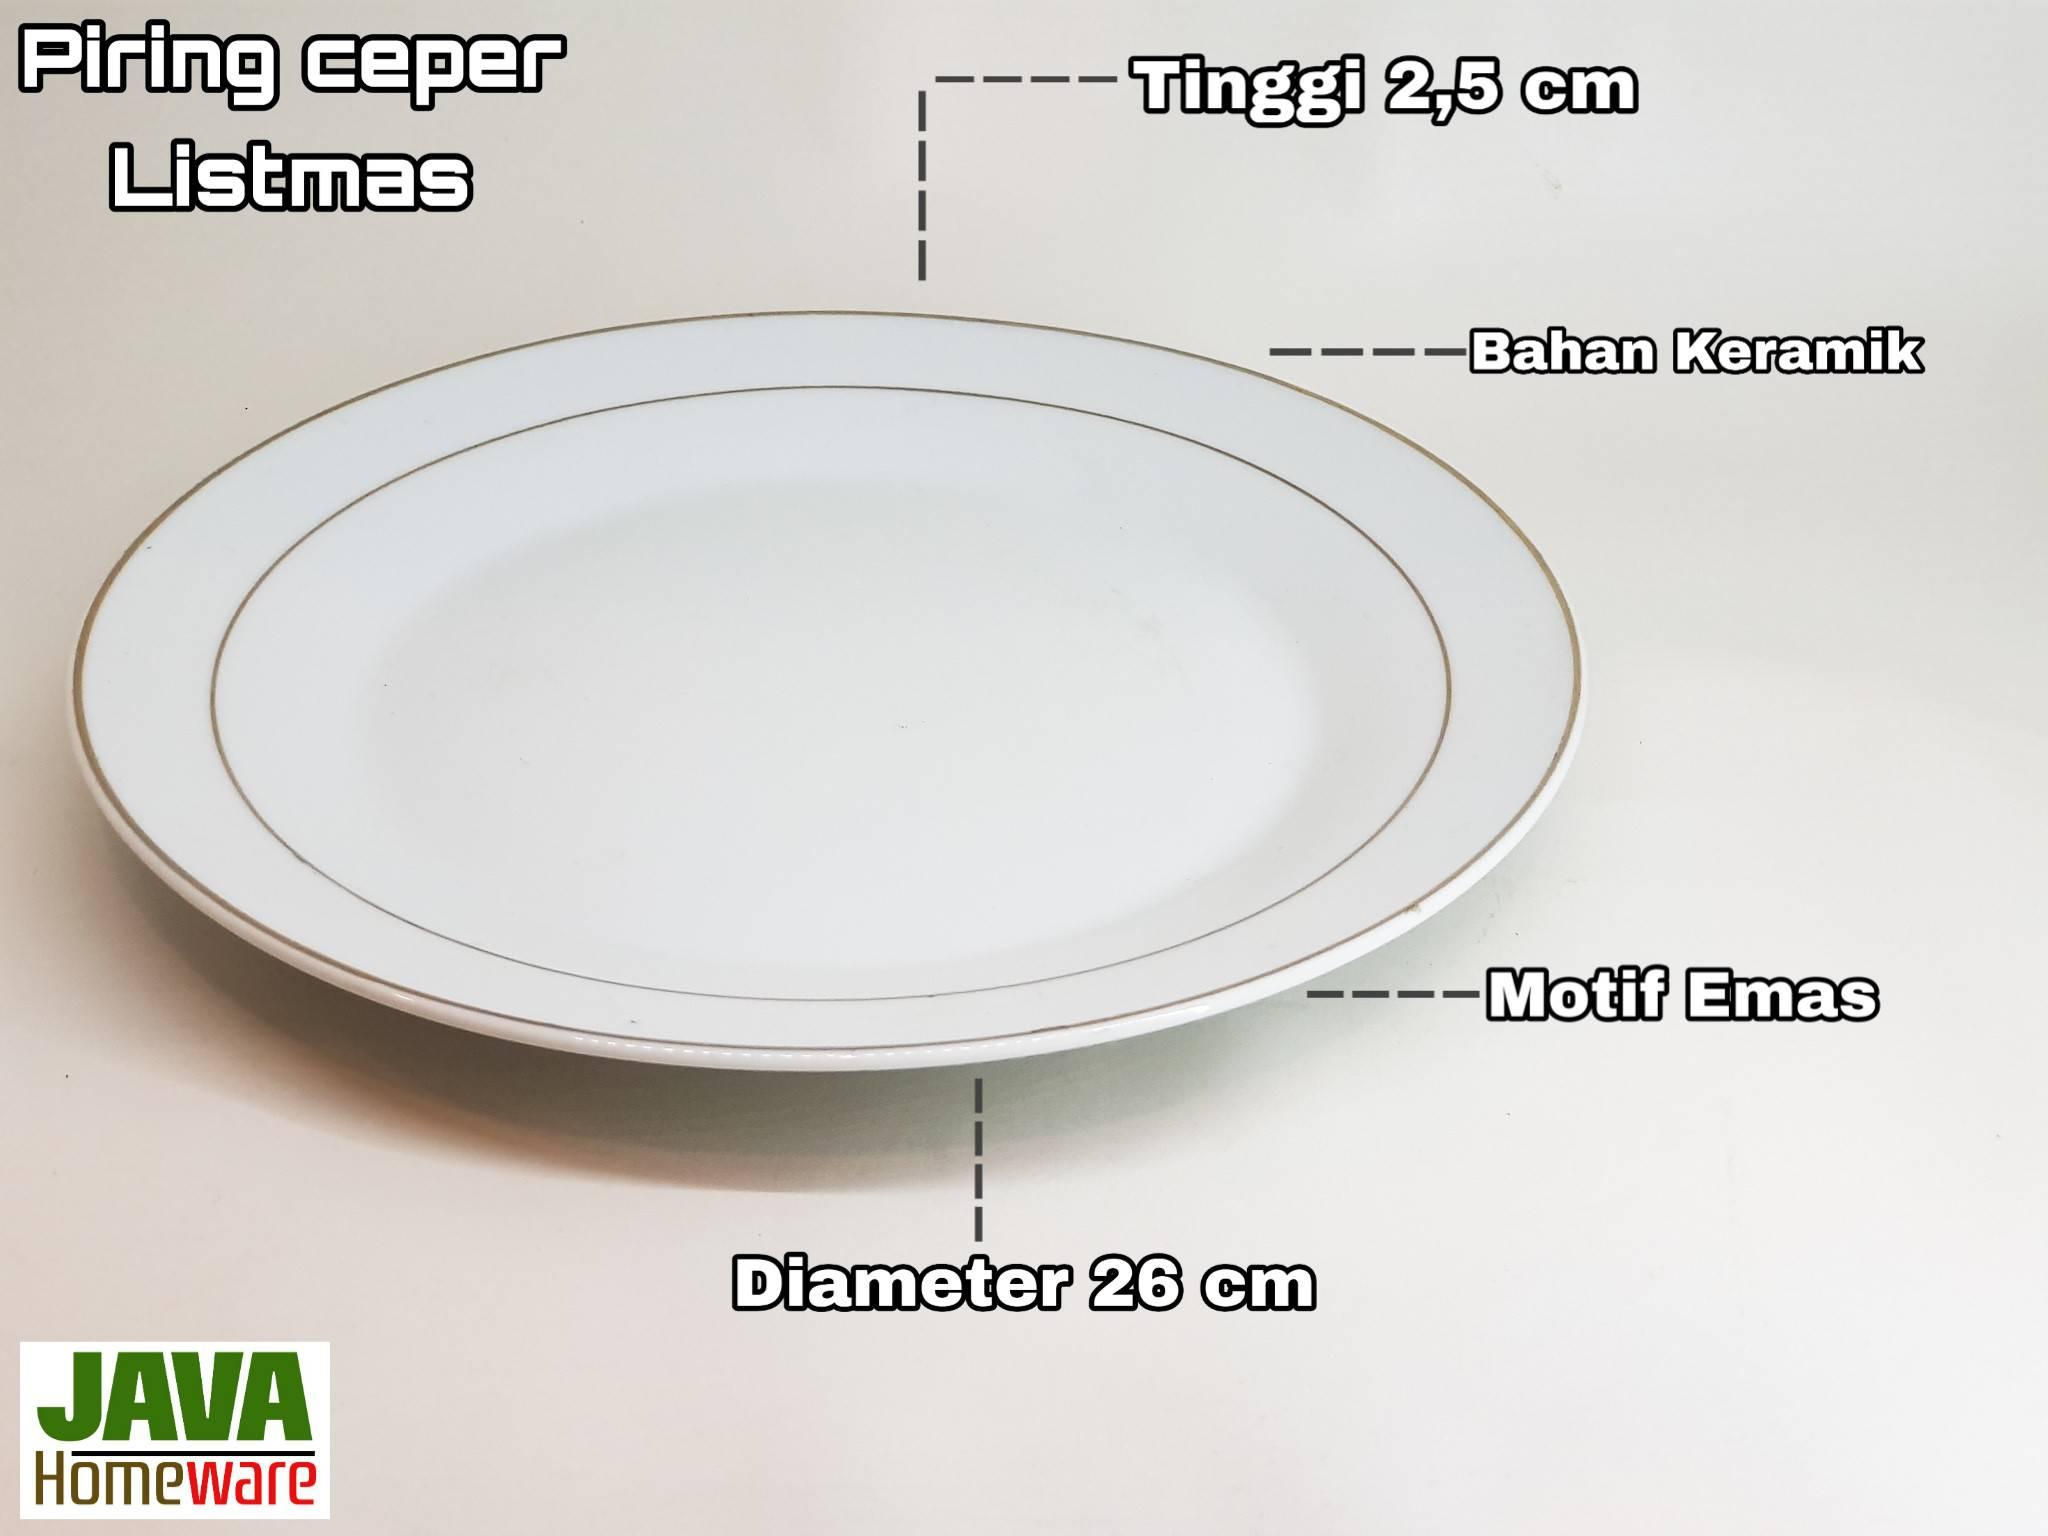 Piring Ceper Putih Listmas